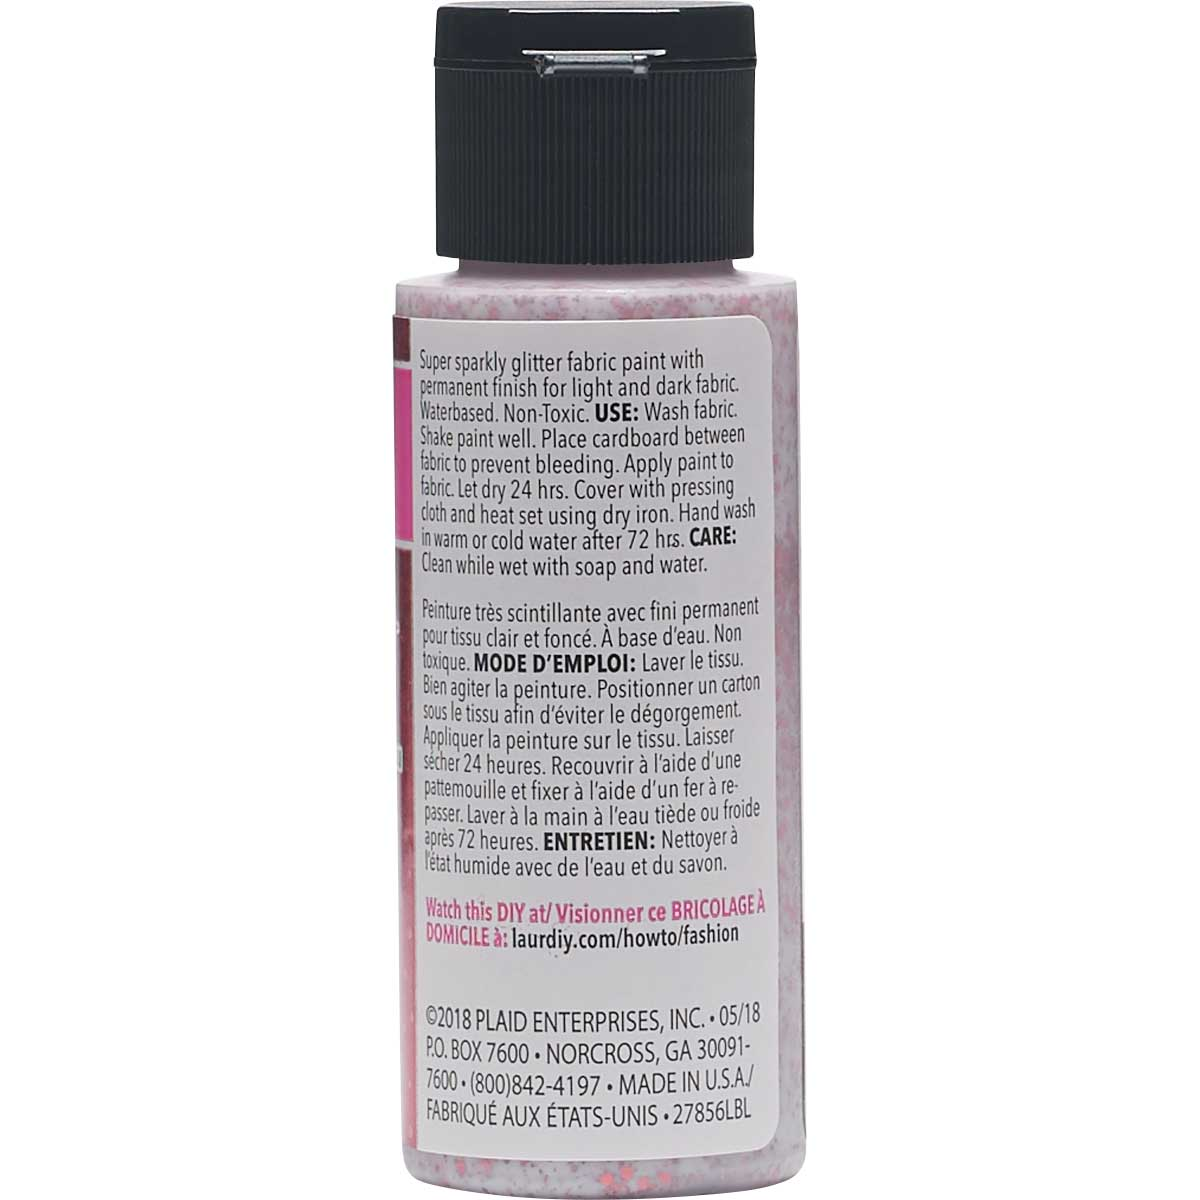 LaurDIY ® Galaxy Glitter Fabric Paint - Big Bang, 2 oz.